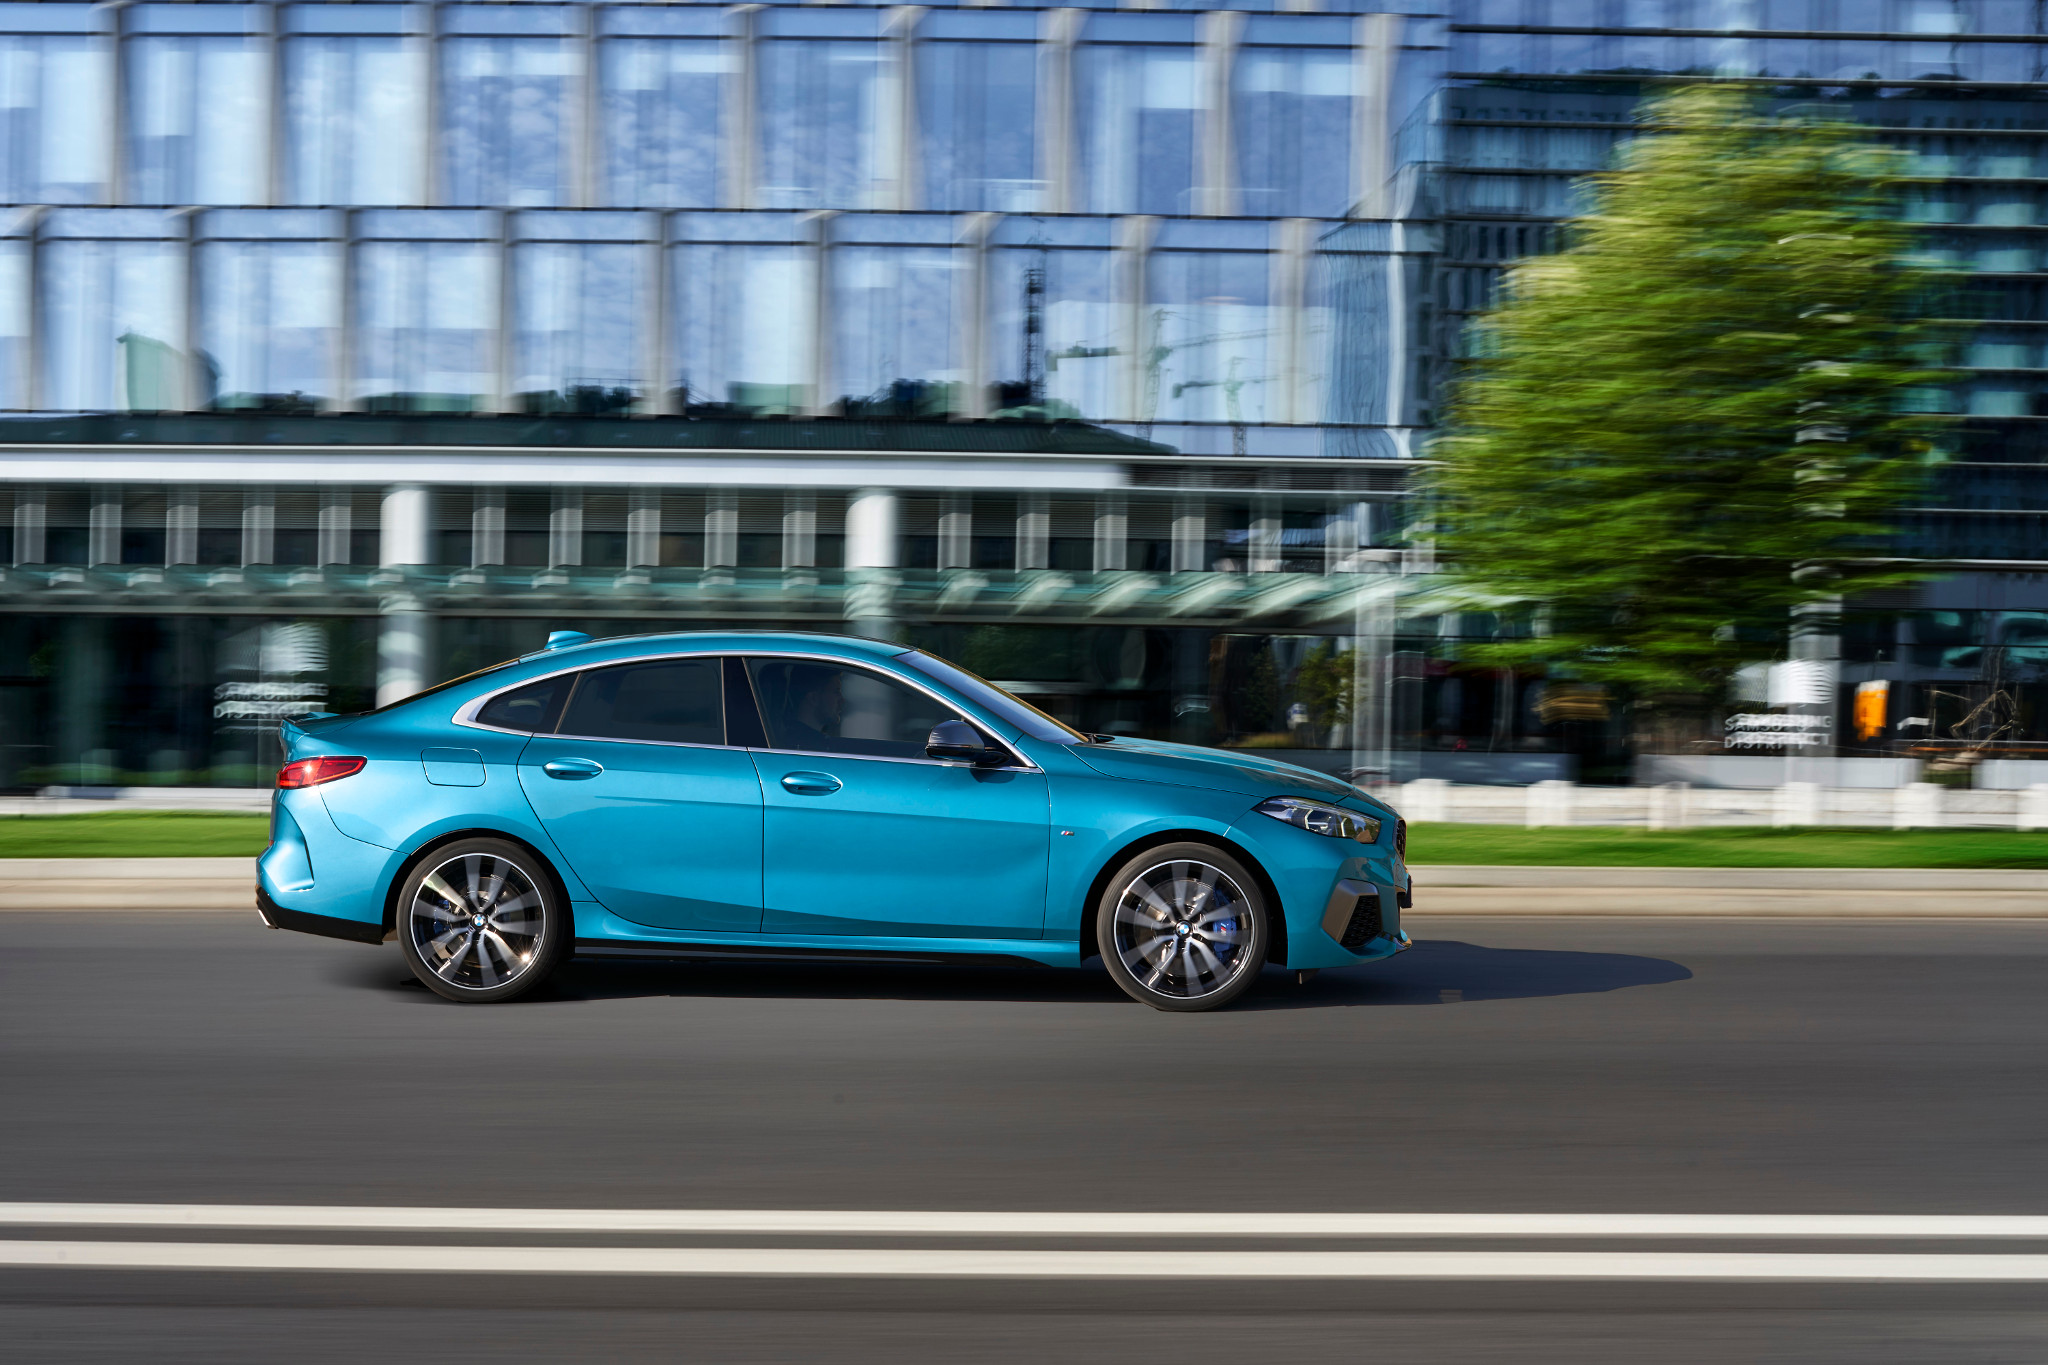 bmw-2-series-gran-coupe-2020-03-blue--exterior--profile.jpg